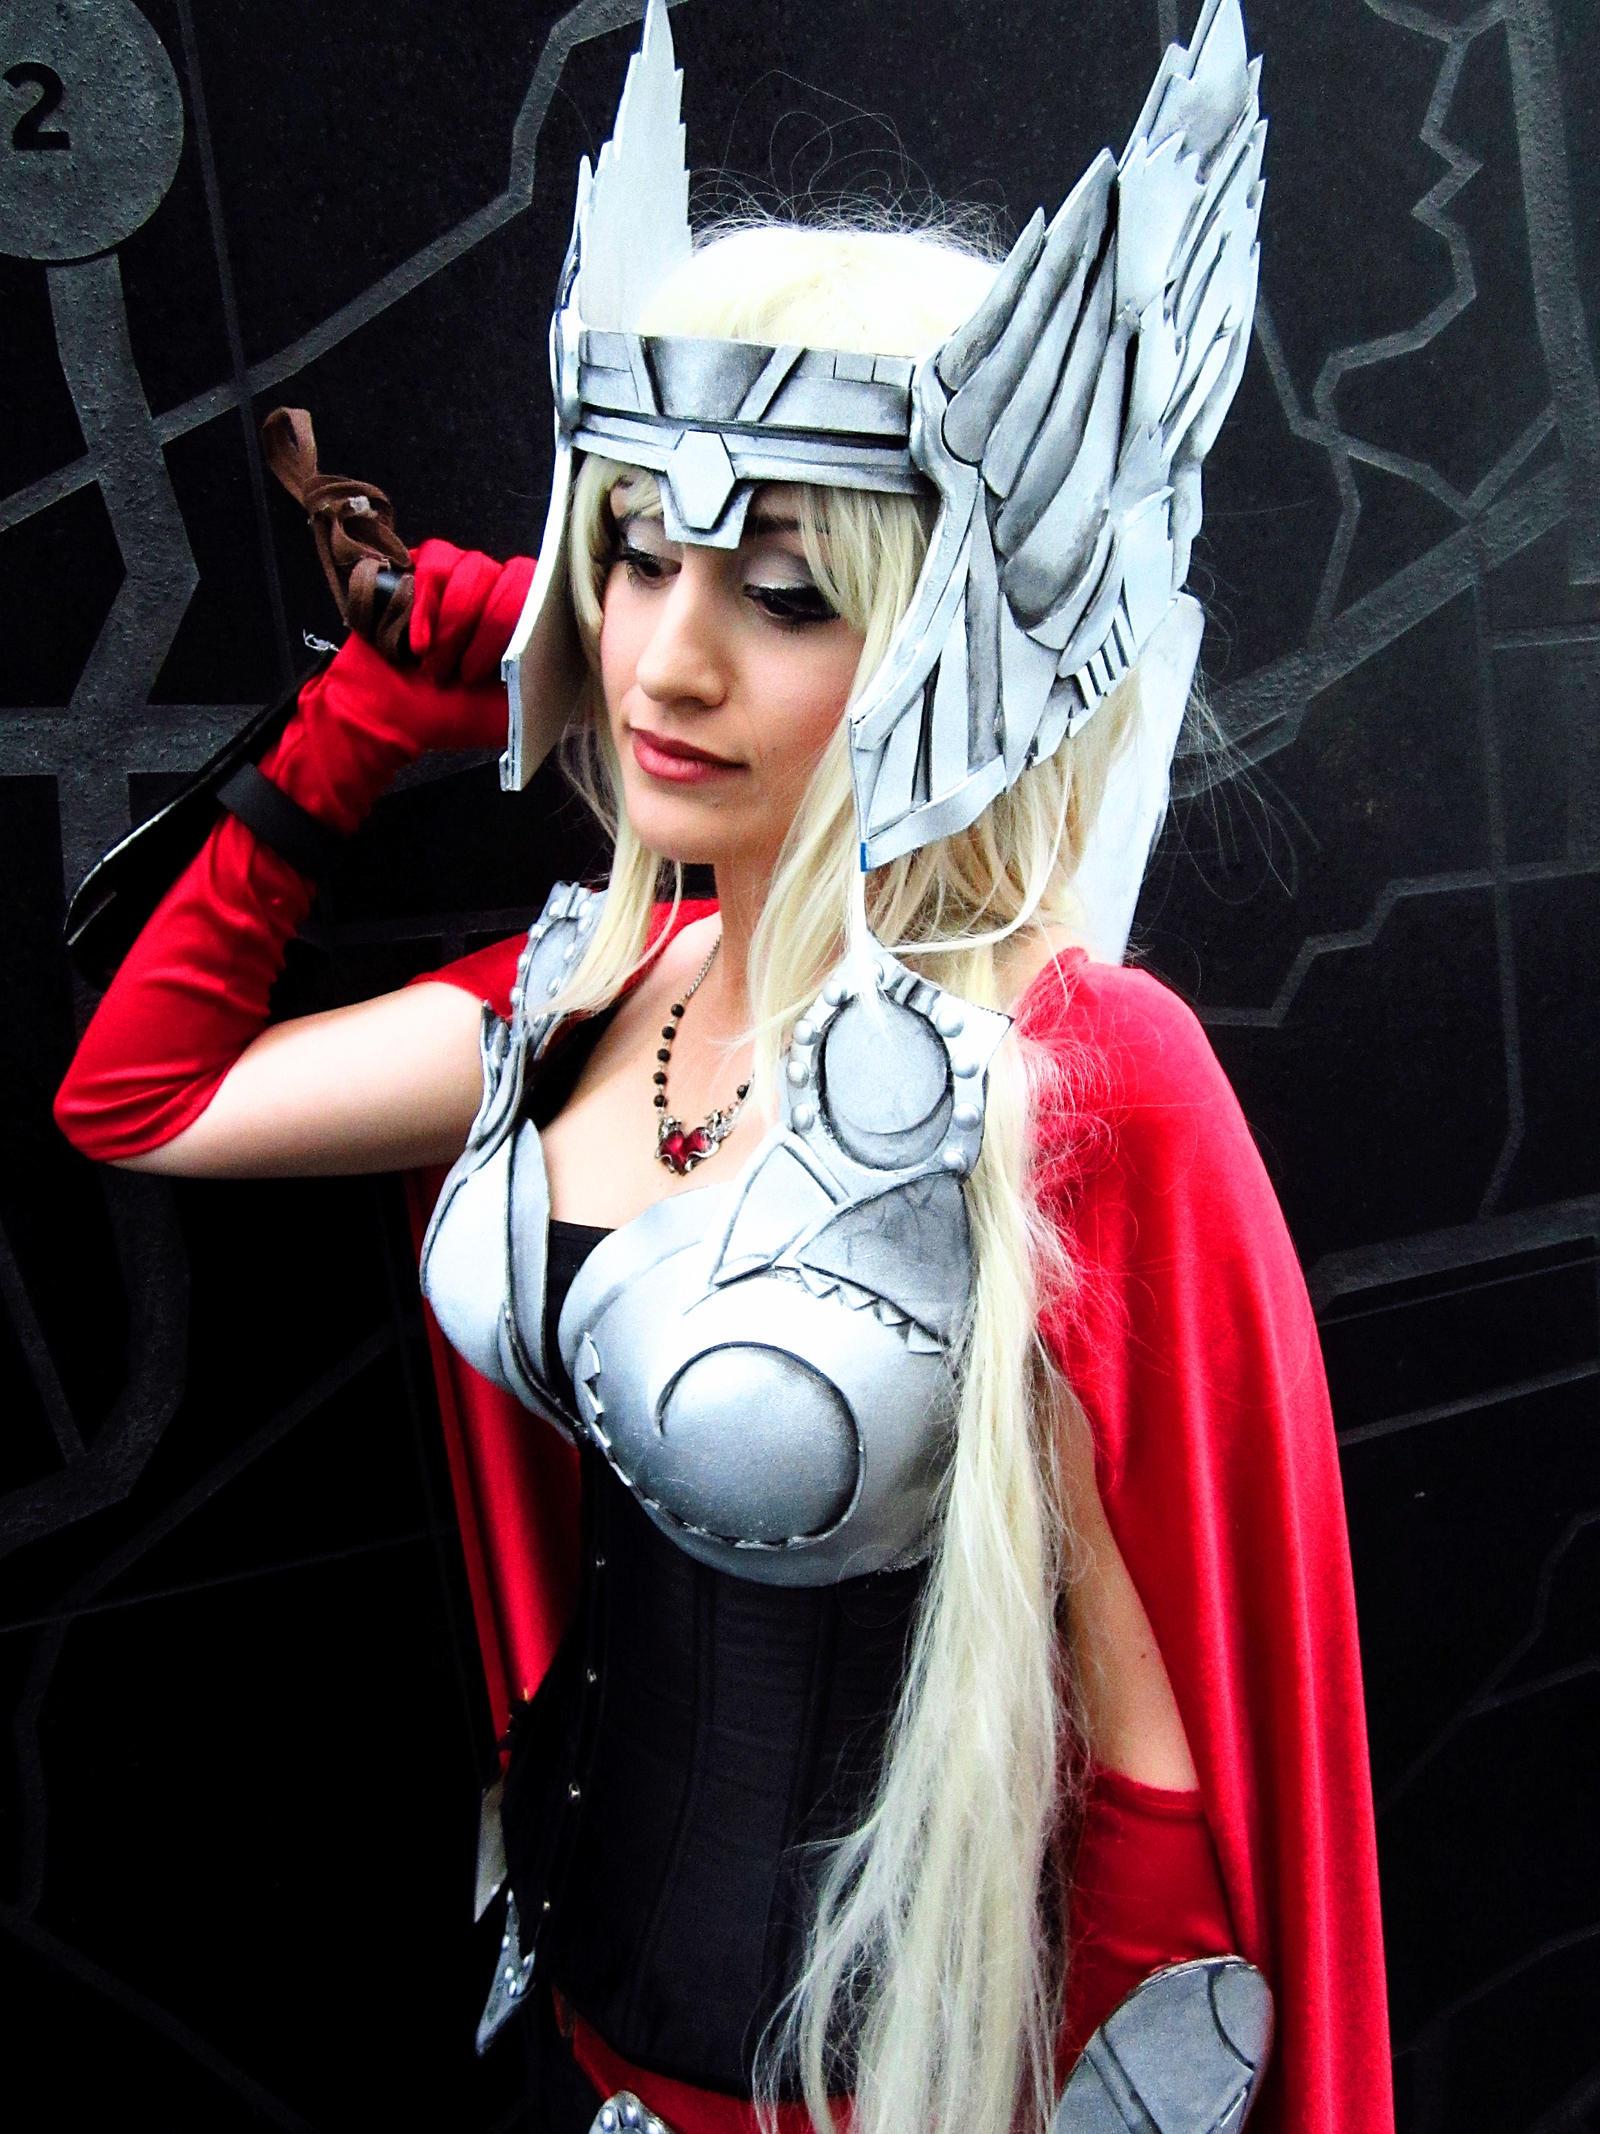 Lady Thor Cosplay By Piratesavvy07 On DeviantArt